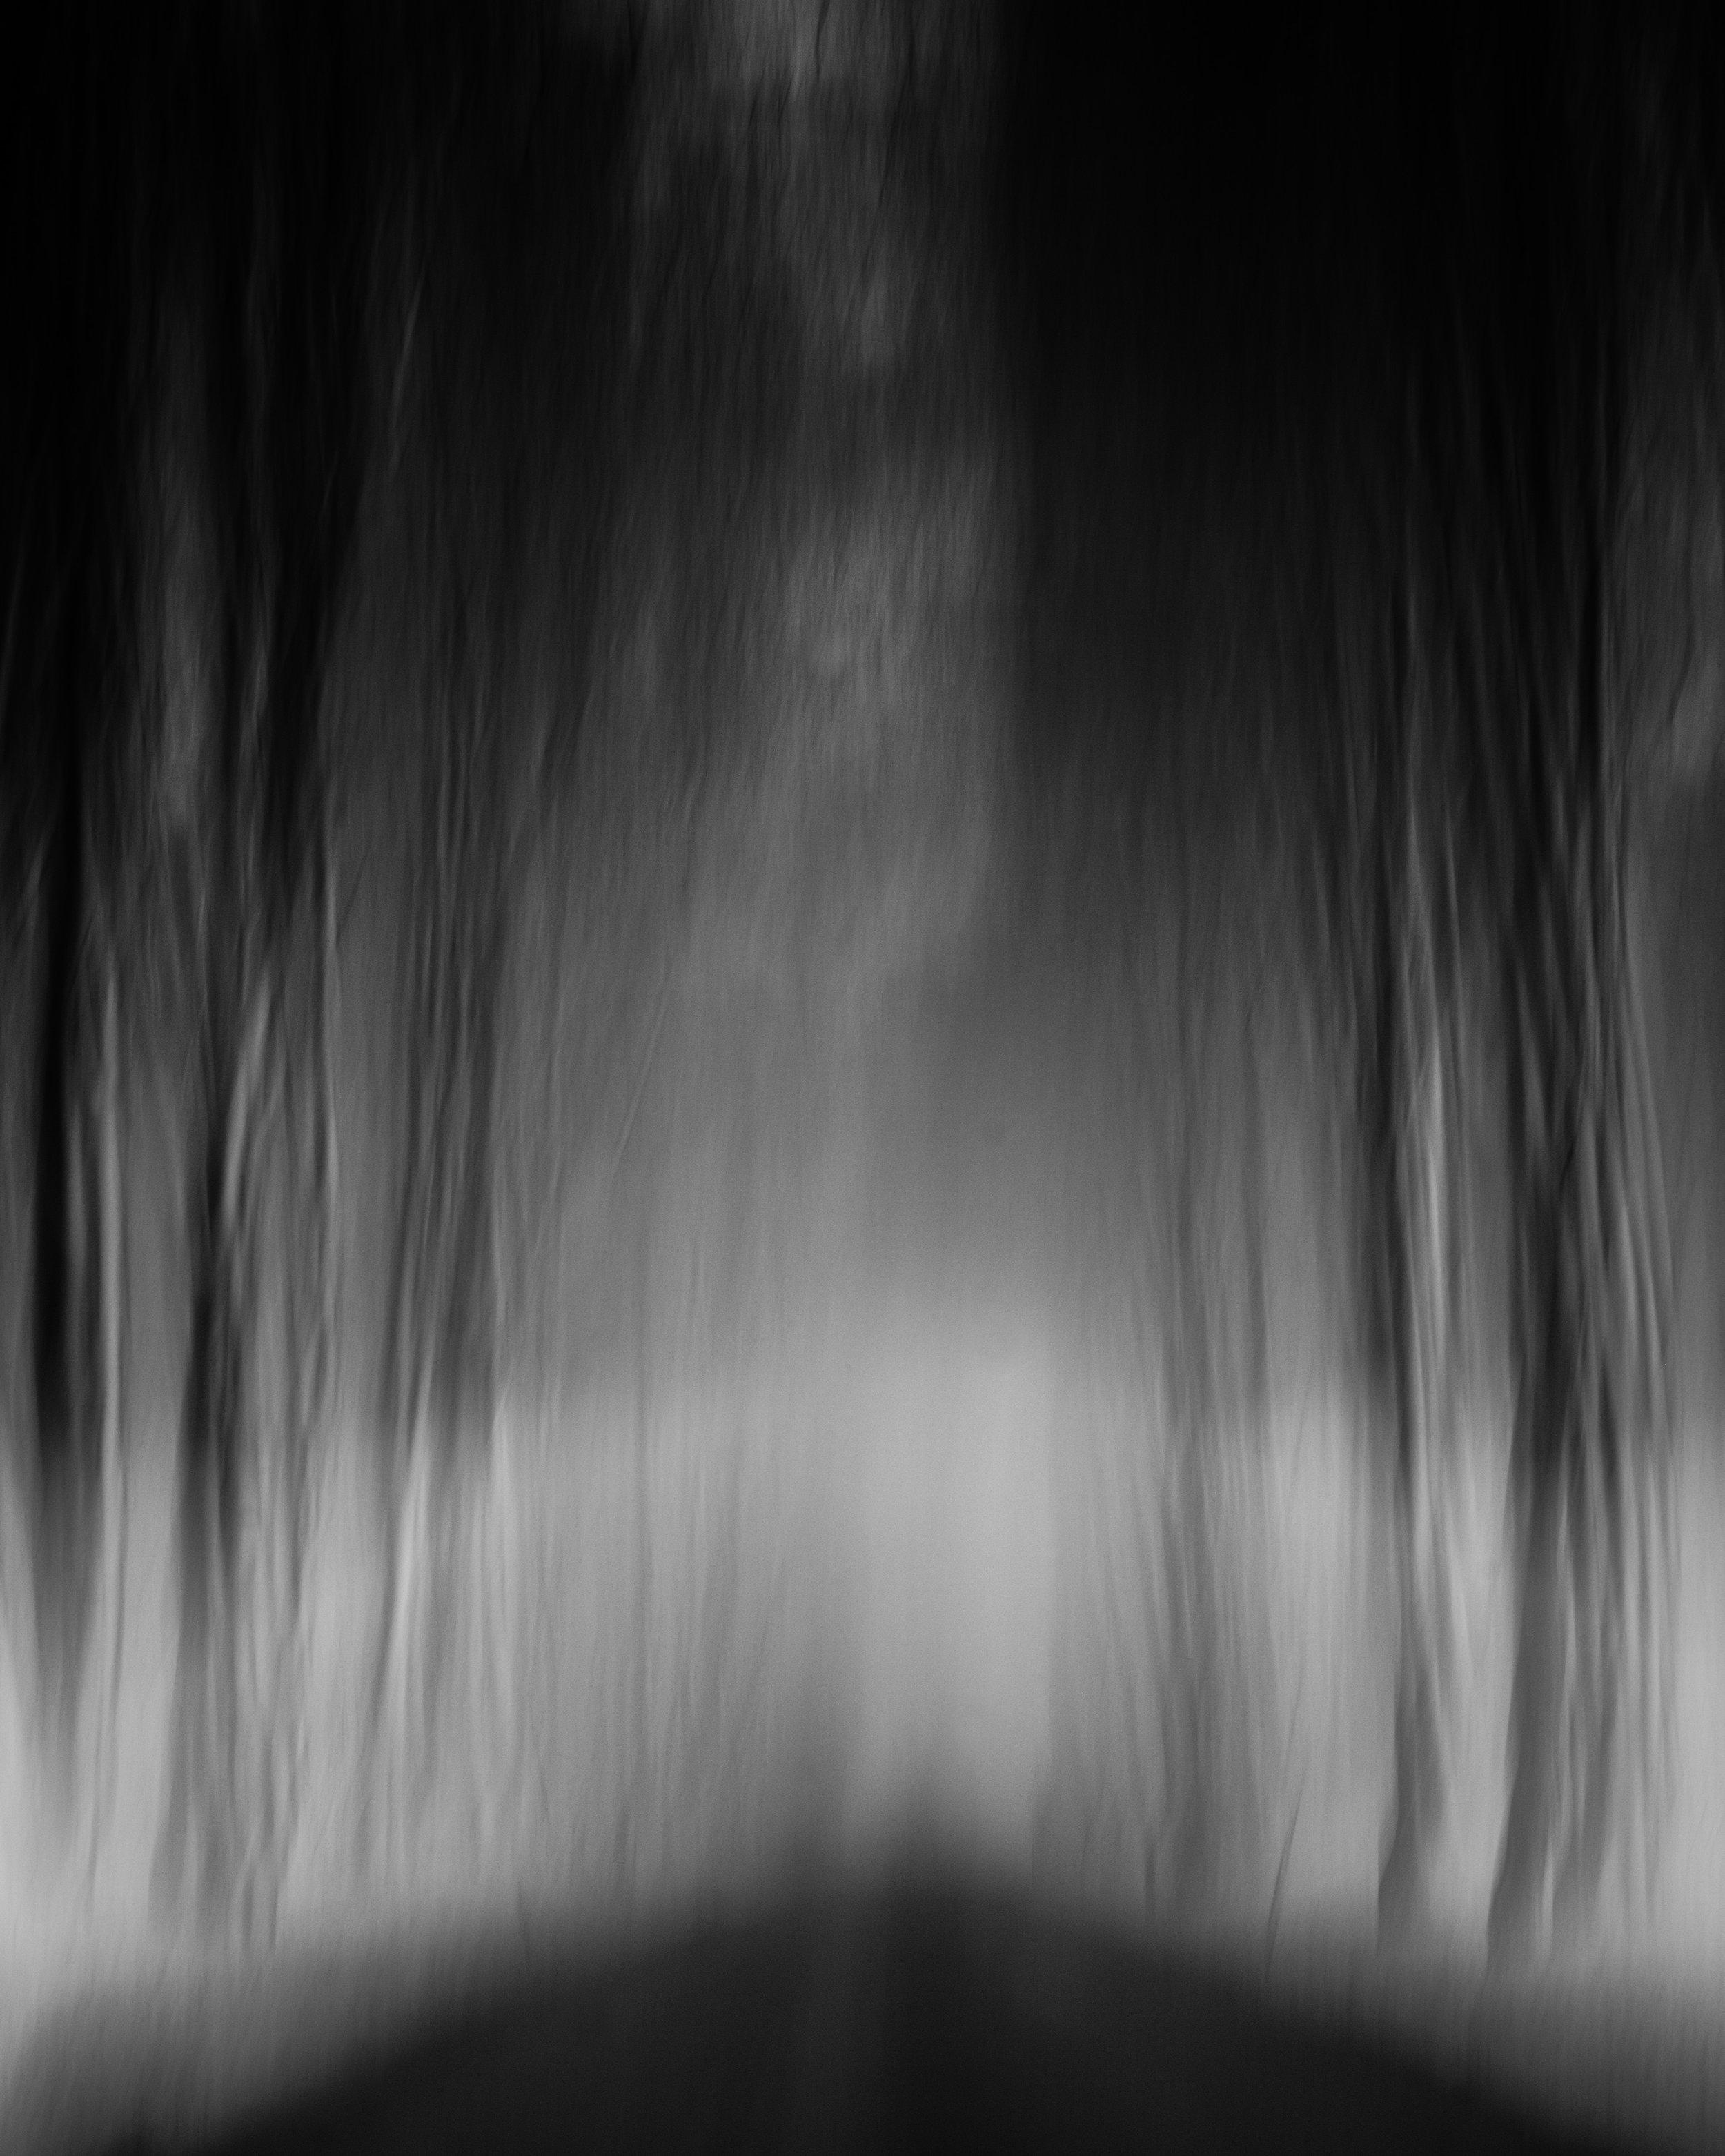 raskarum road fog motion blur 1.jpg